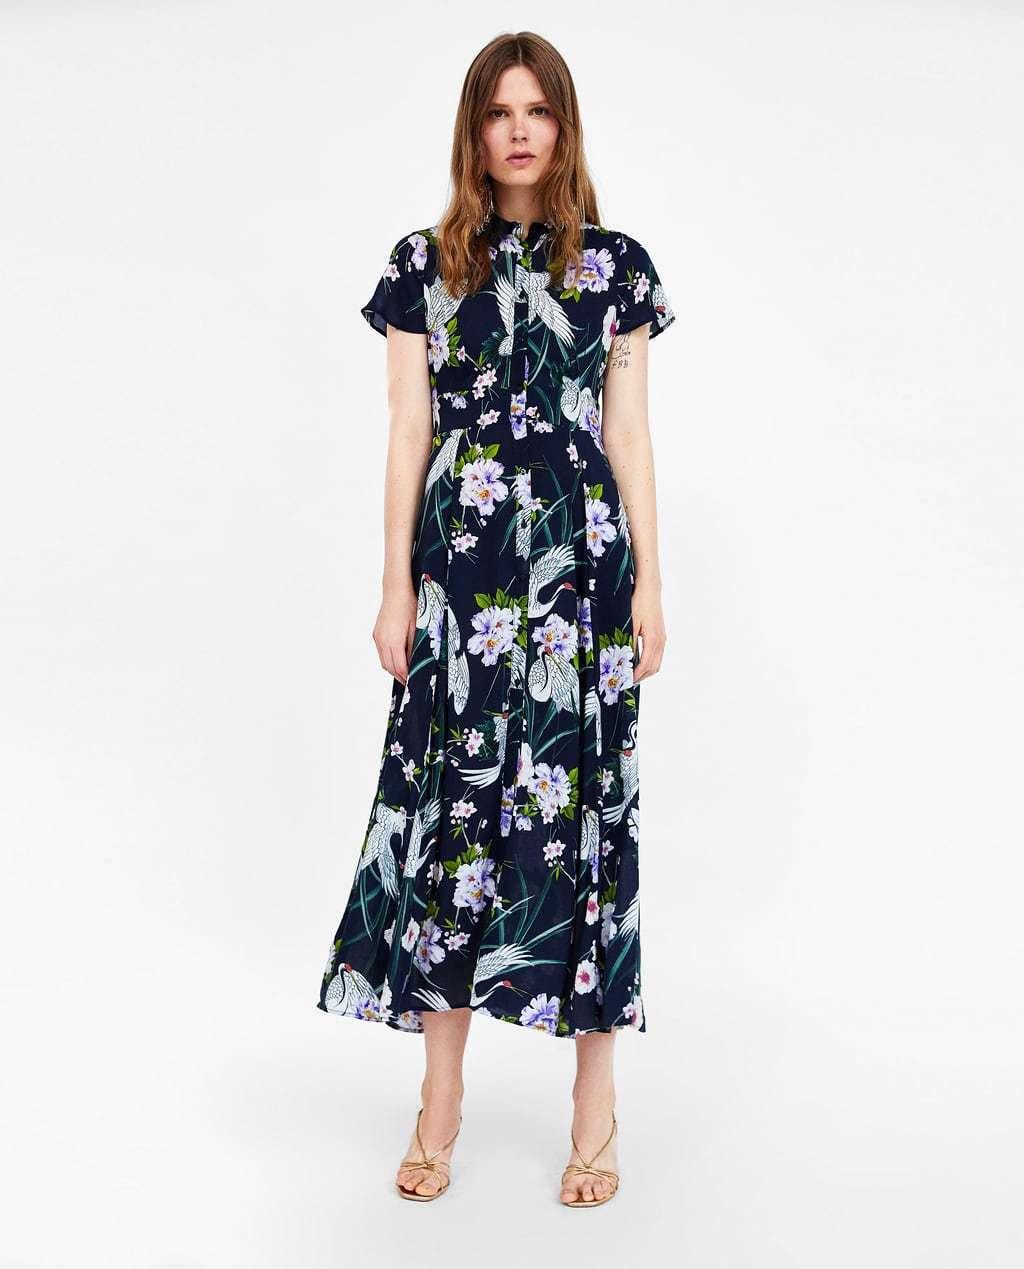 Zara Bleu Taille Marine Long Imprime Floral Robe Chemise Taille Bleu